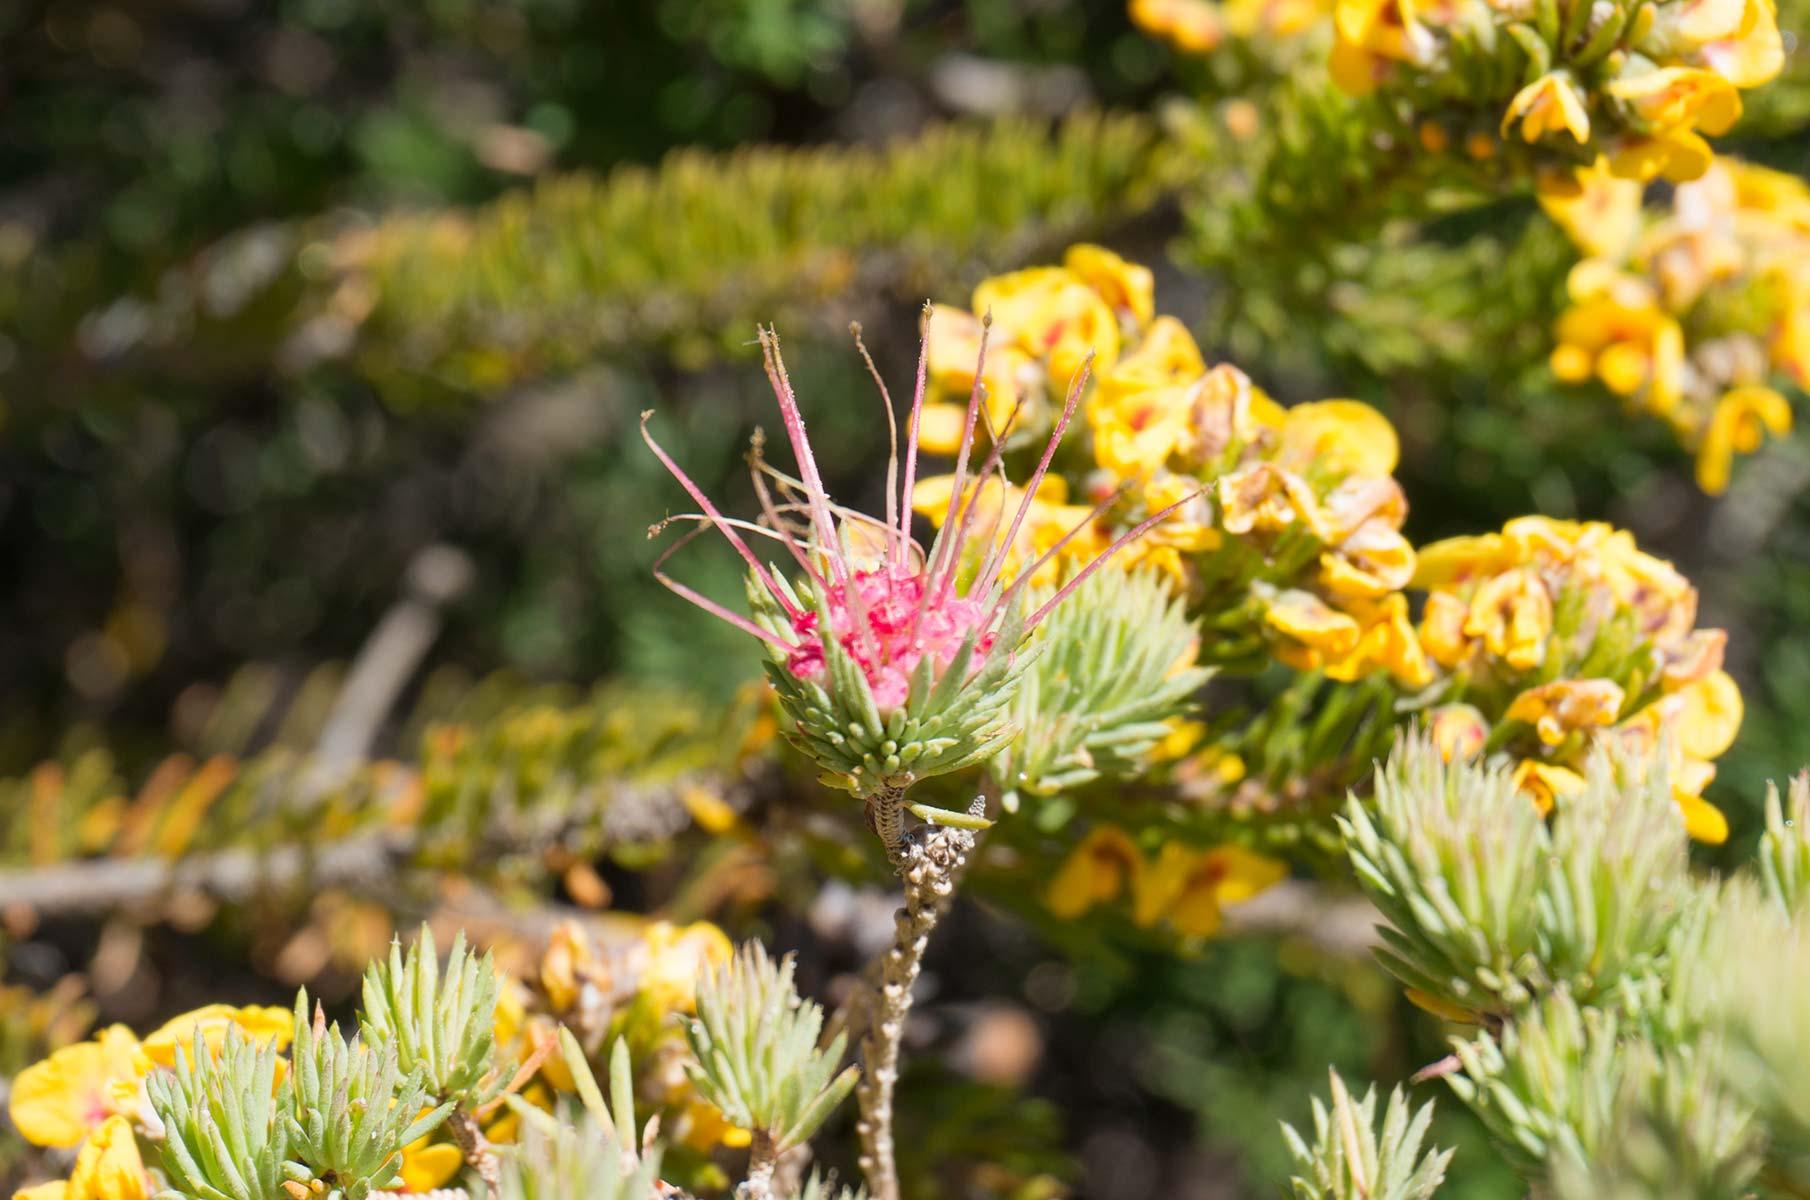 Pflanzen im Royal National Park, Australien